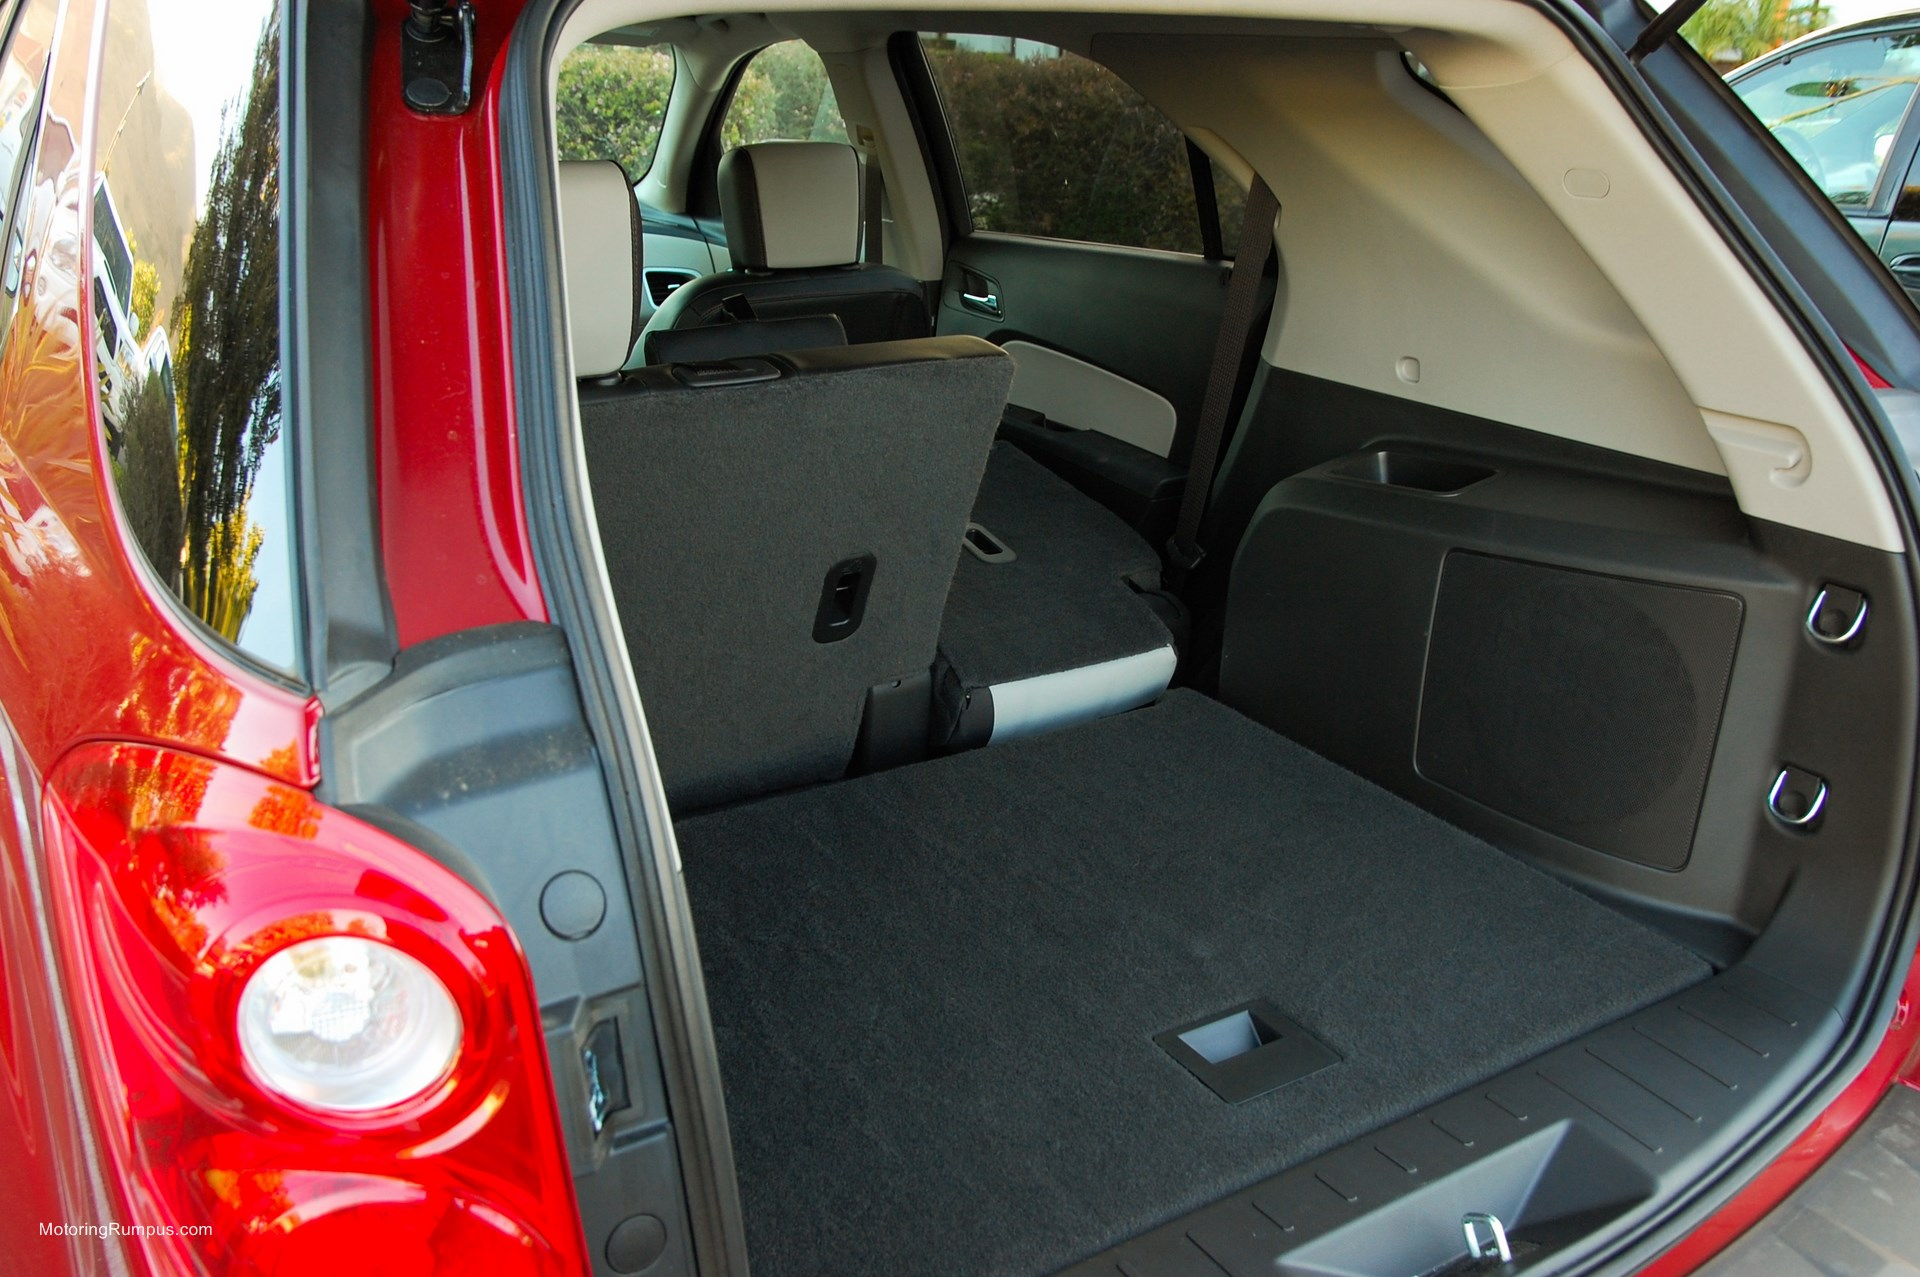 2014 Chevy Equinox Cargo Space